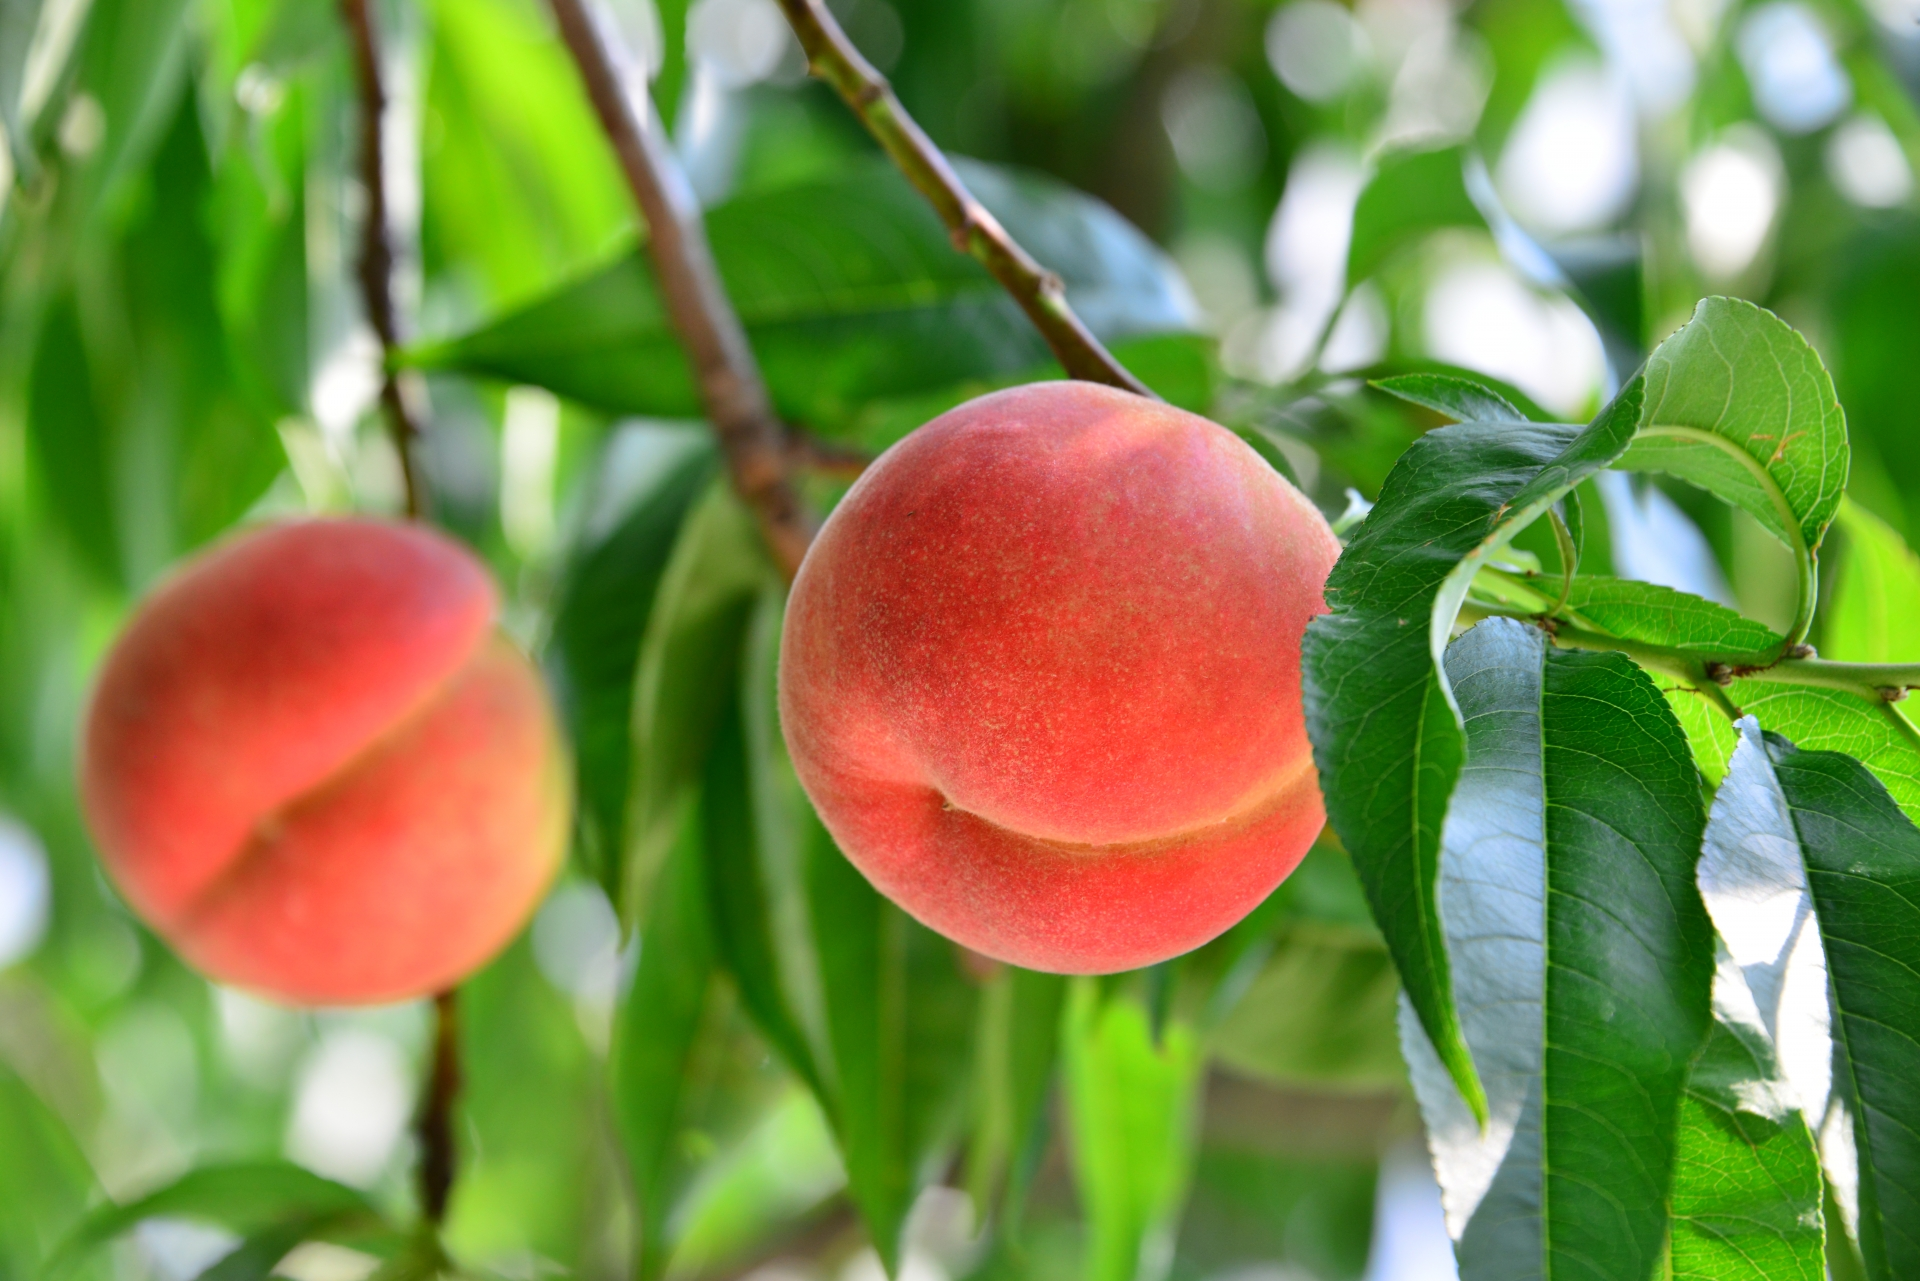 Enjoy Nagano's Delicious Fruit